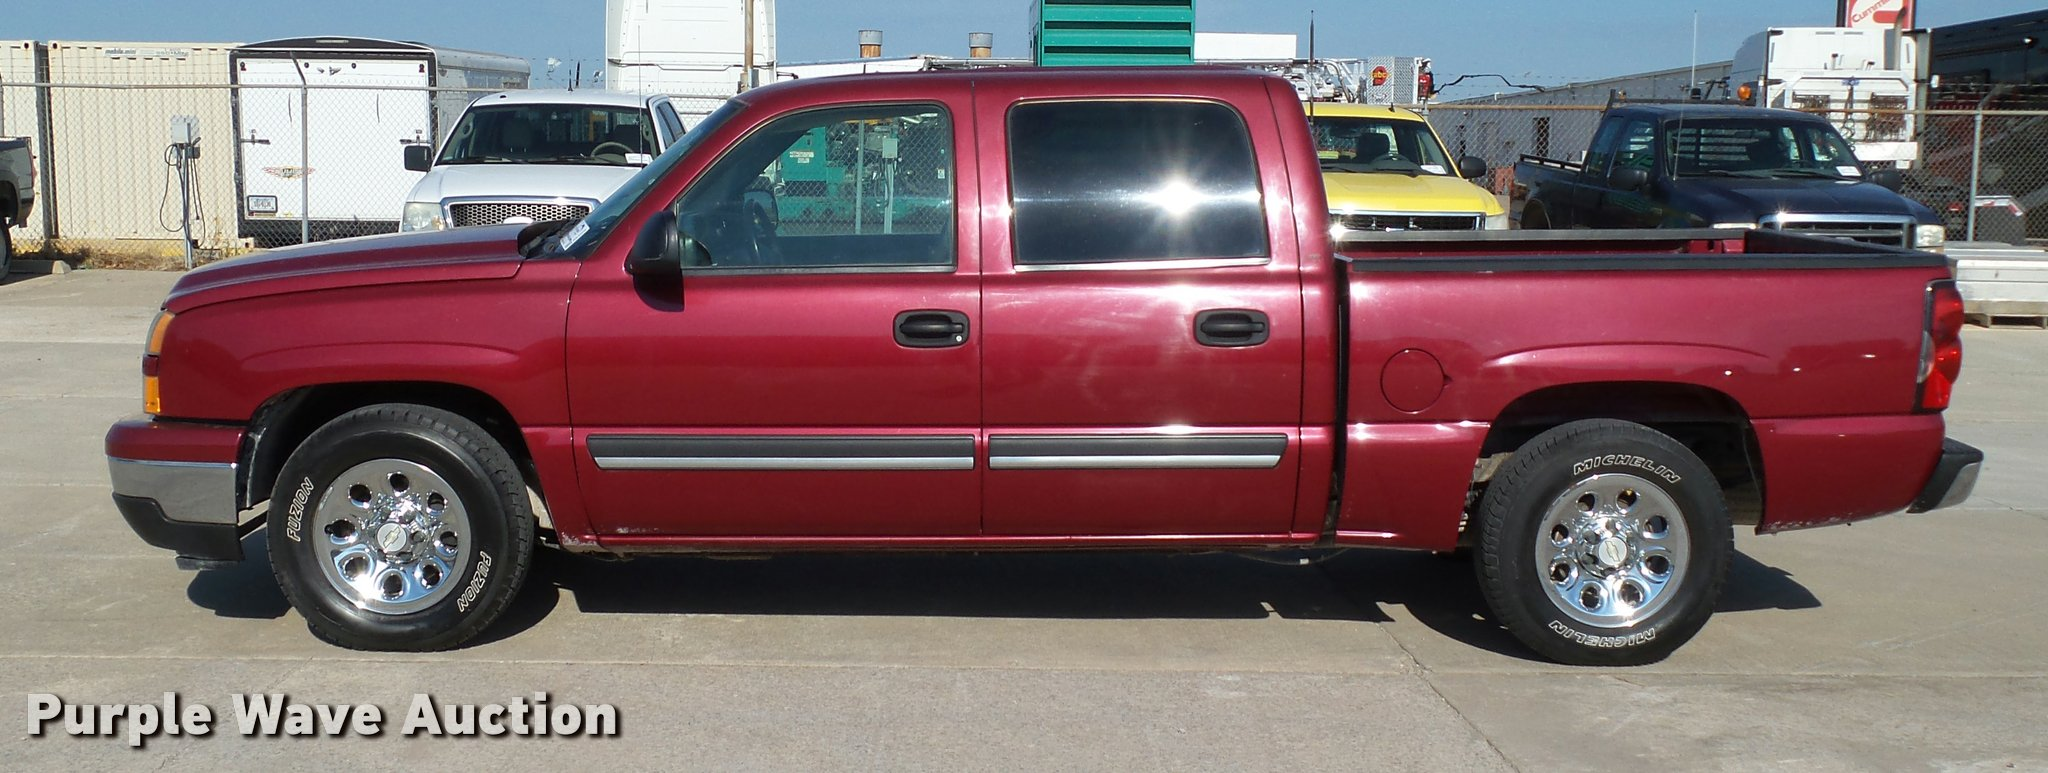 2006 Chevrolet Silverado 1500 Crew Cab pickup truck | Item D...